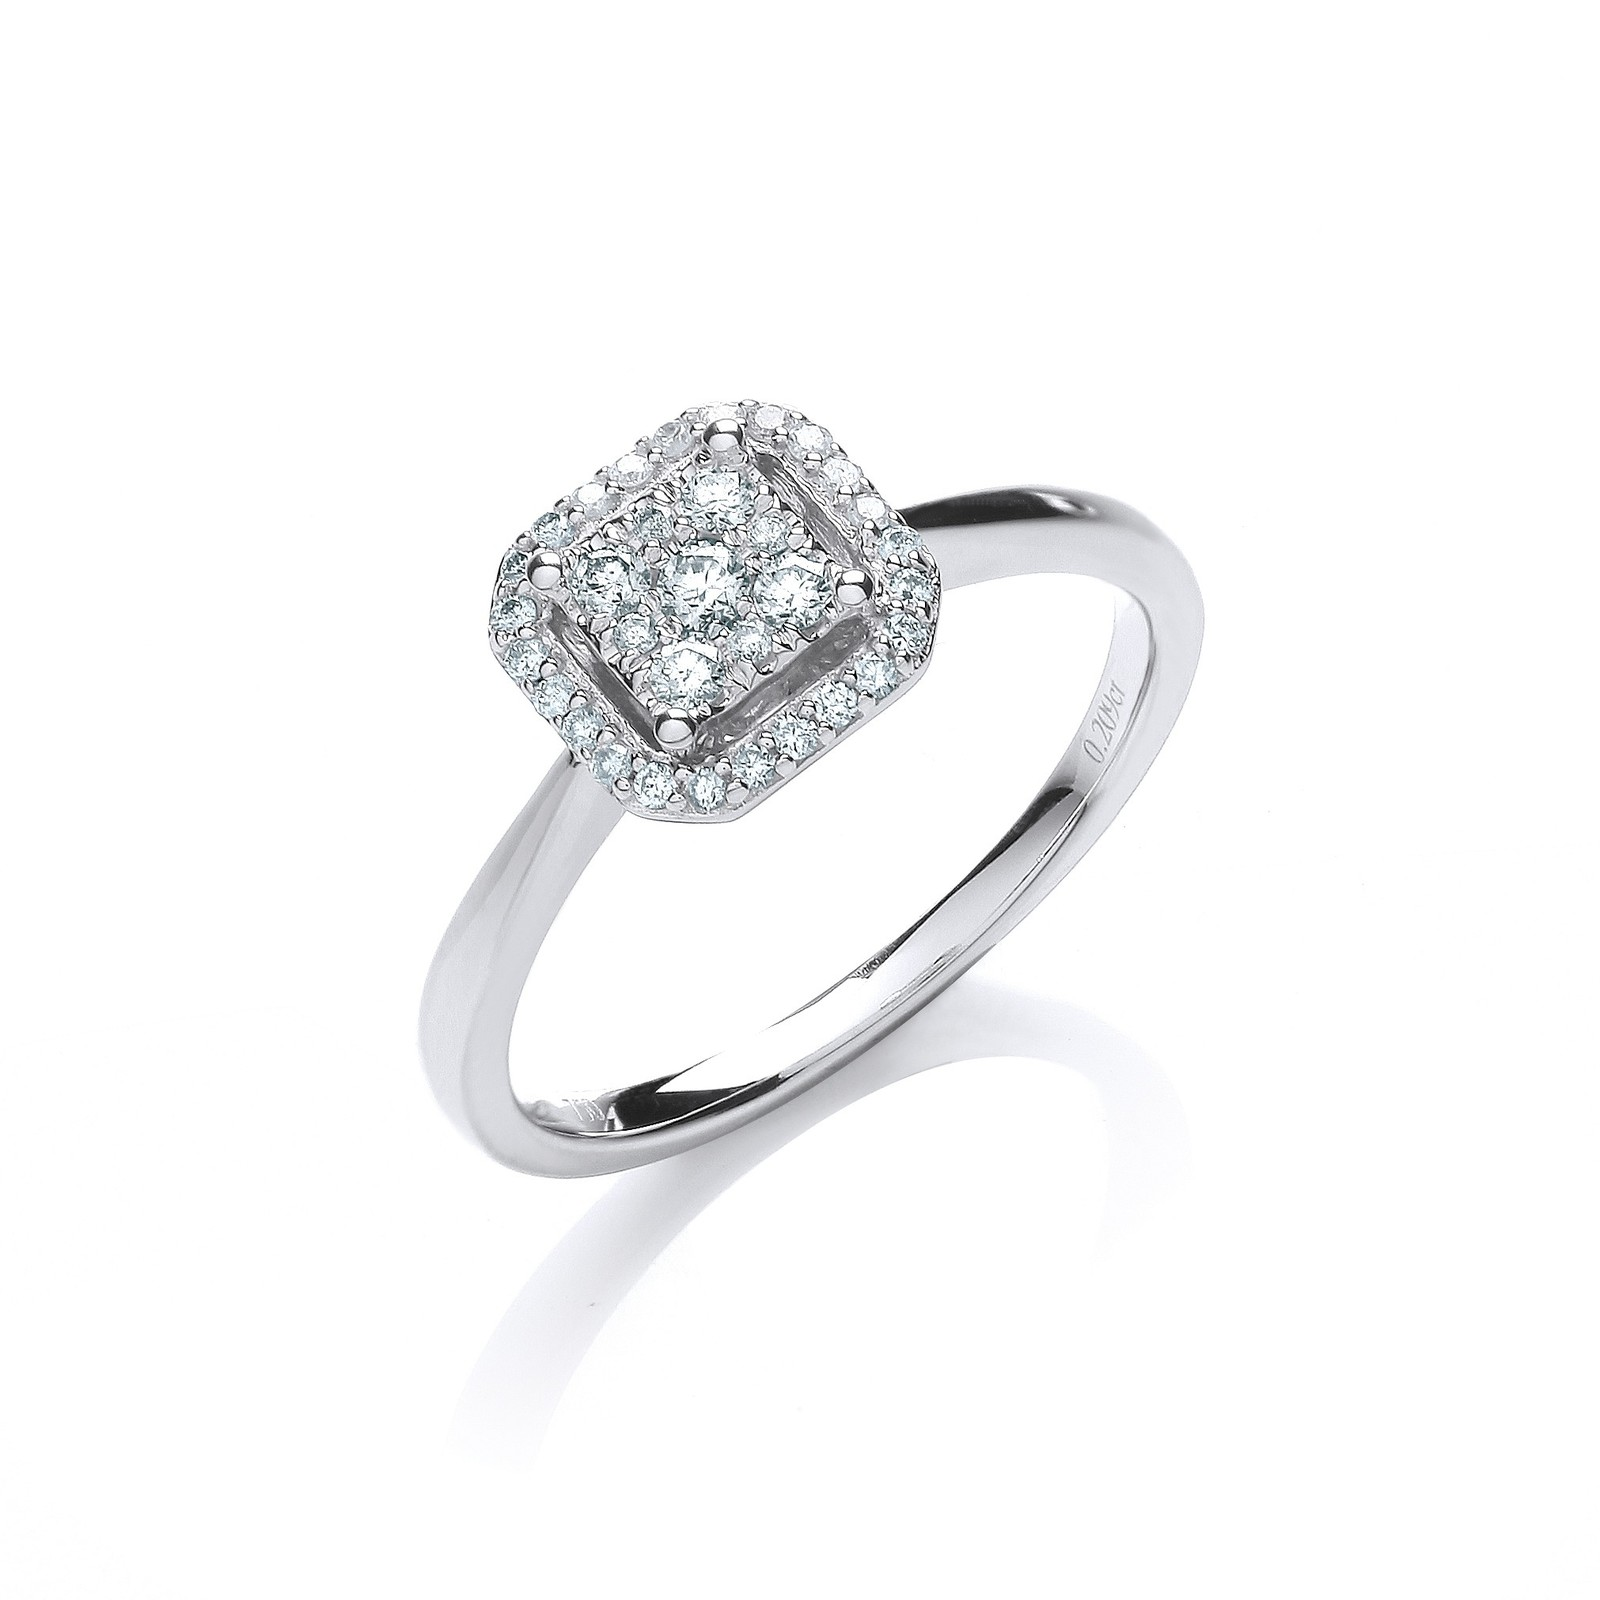 18ct White Gold 0.20ct Diamond Dress Ring